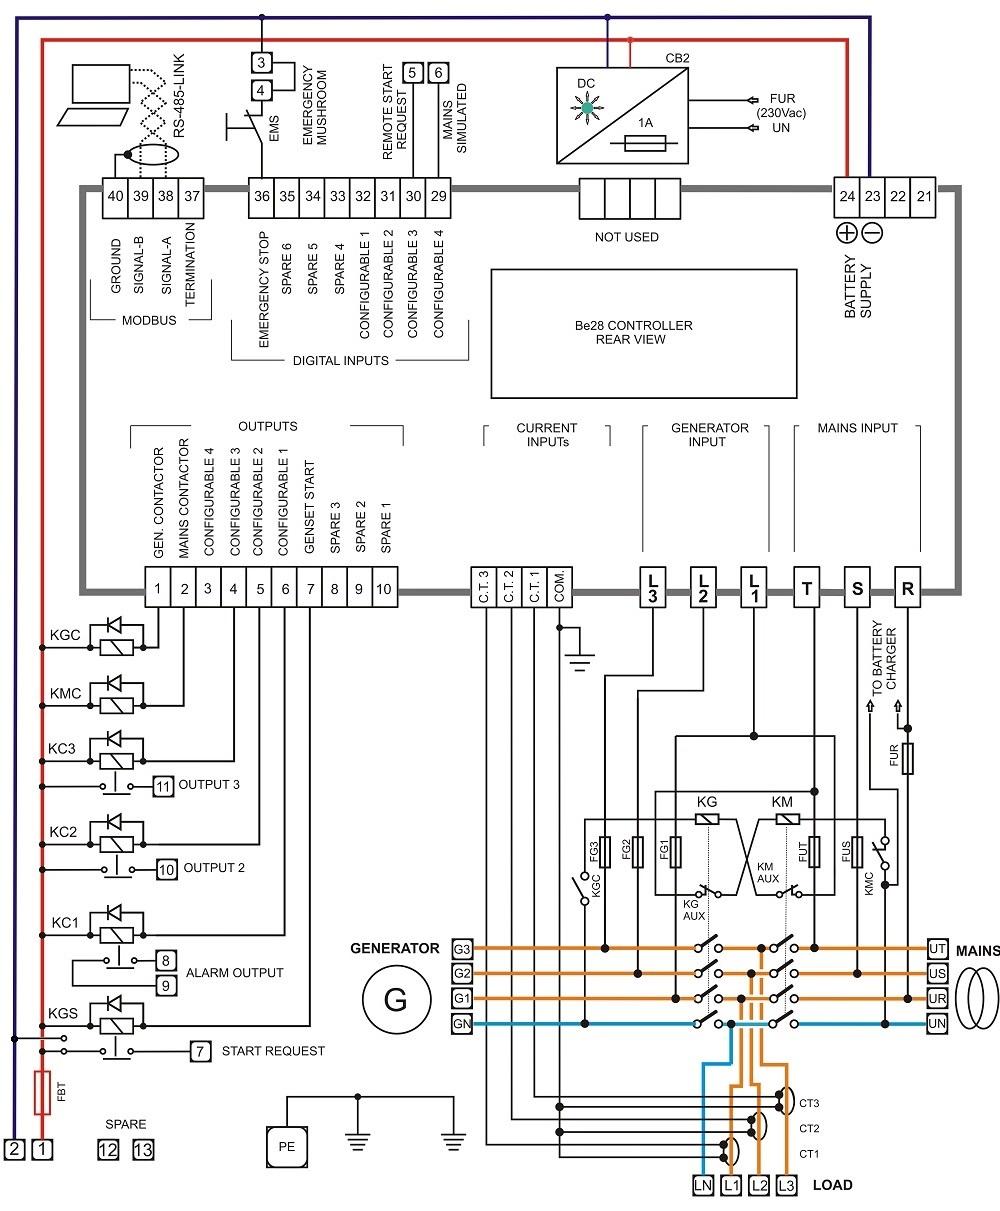 ... nice citroen c3 wiring diagram mold electrical and wiring diagram  Electric Motor Starters Wiring Schematics citroen